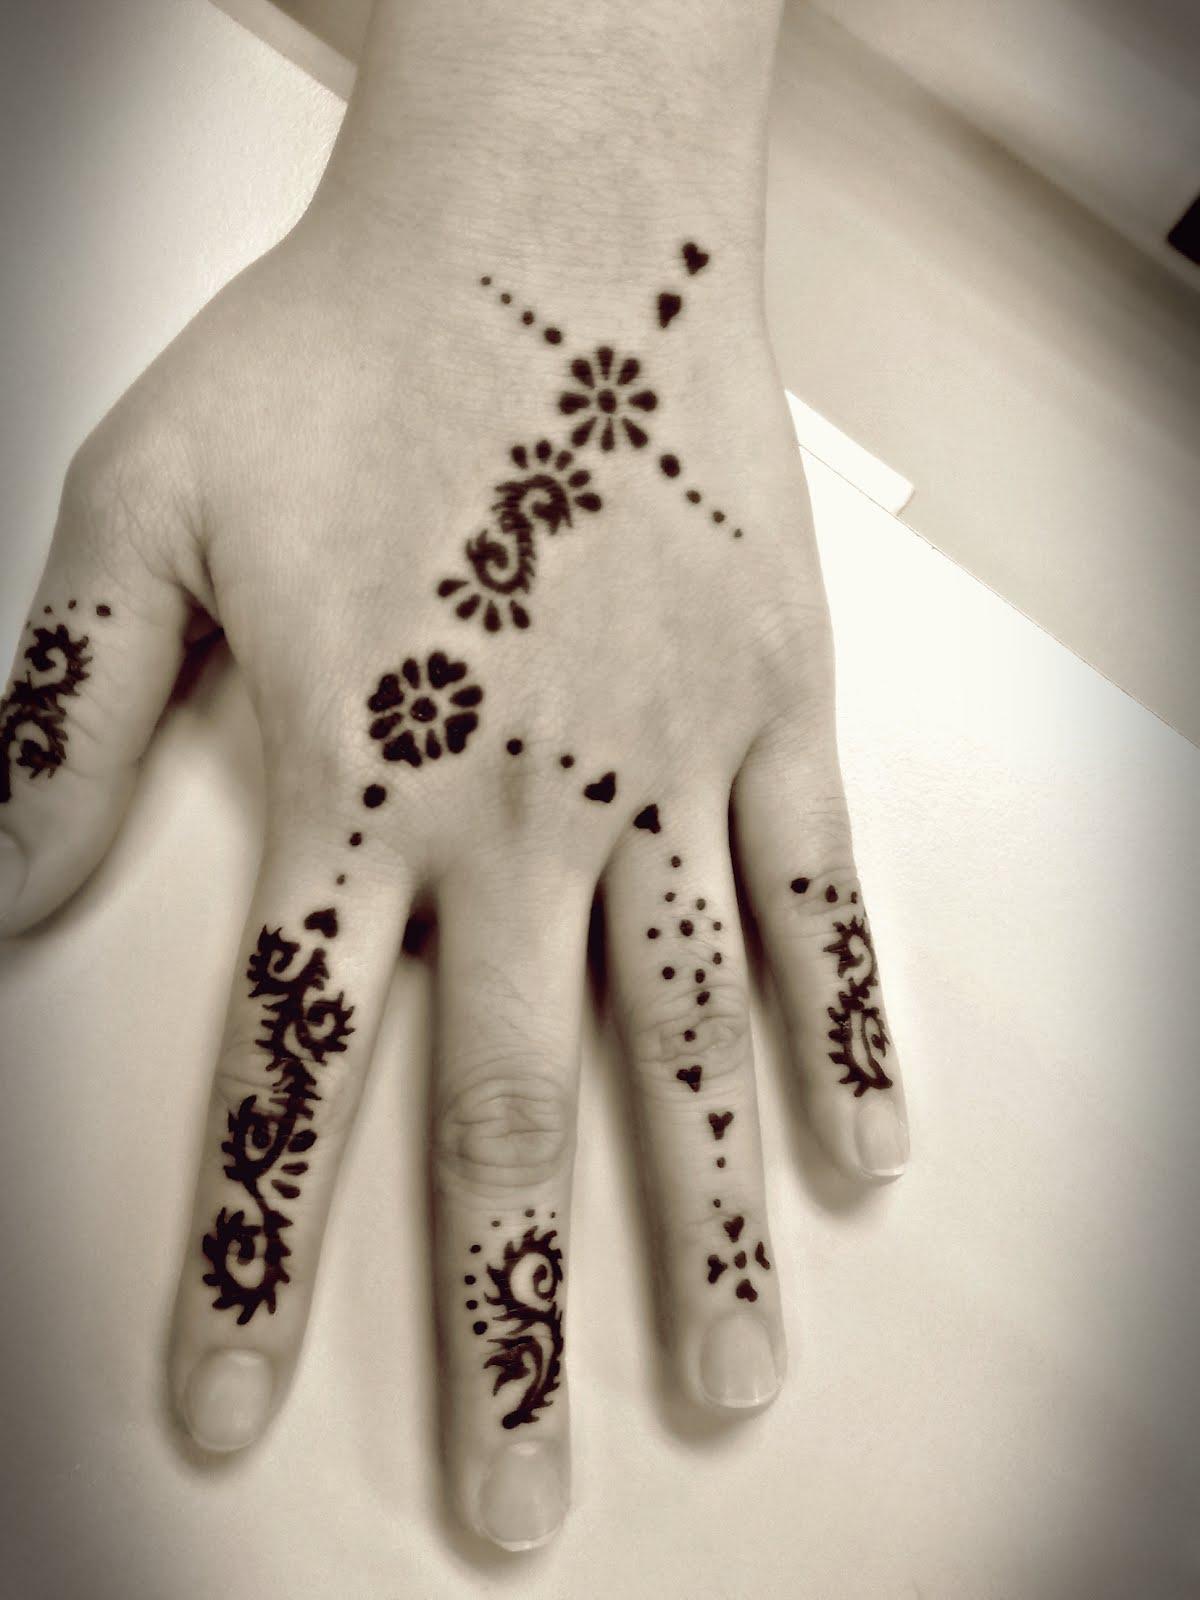 Gambar Henna Mudah Ditiru Balehenna